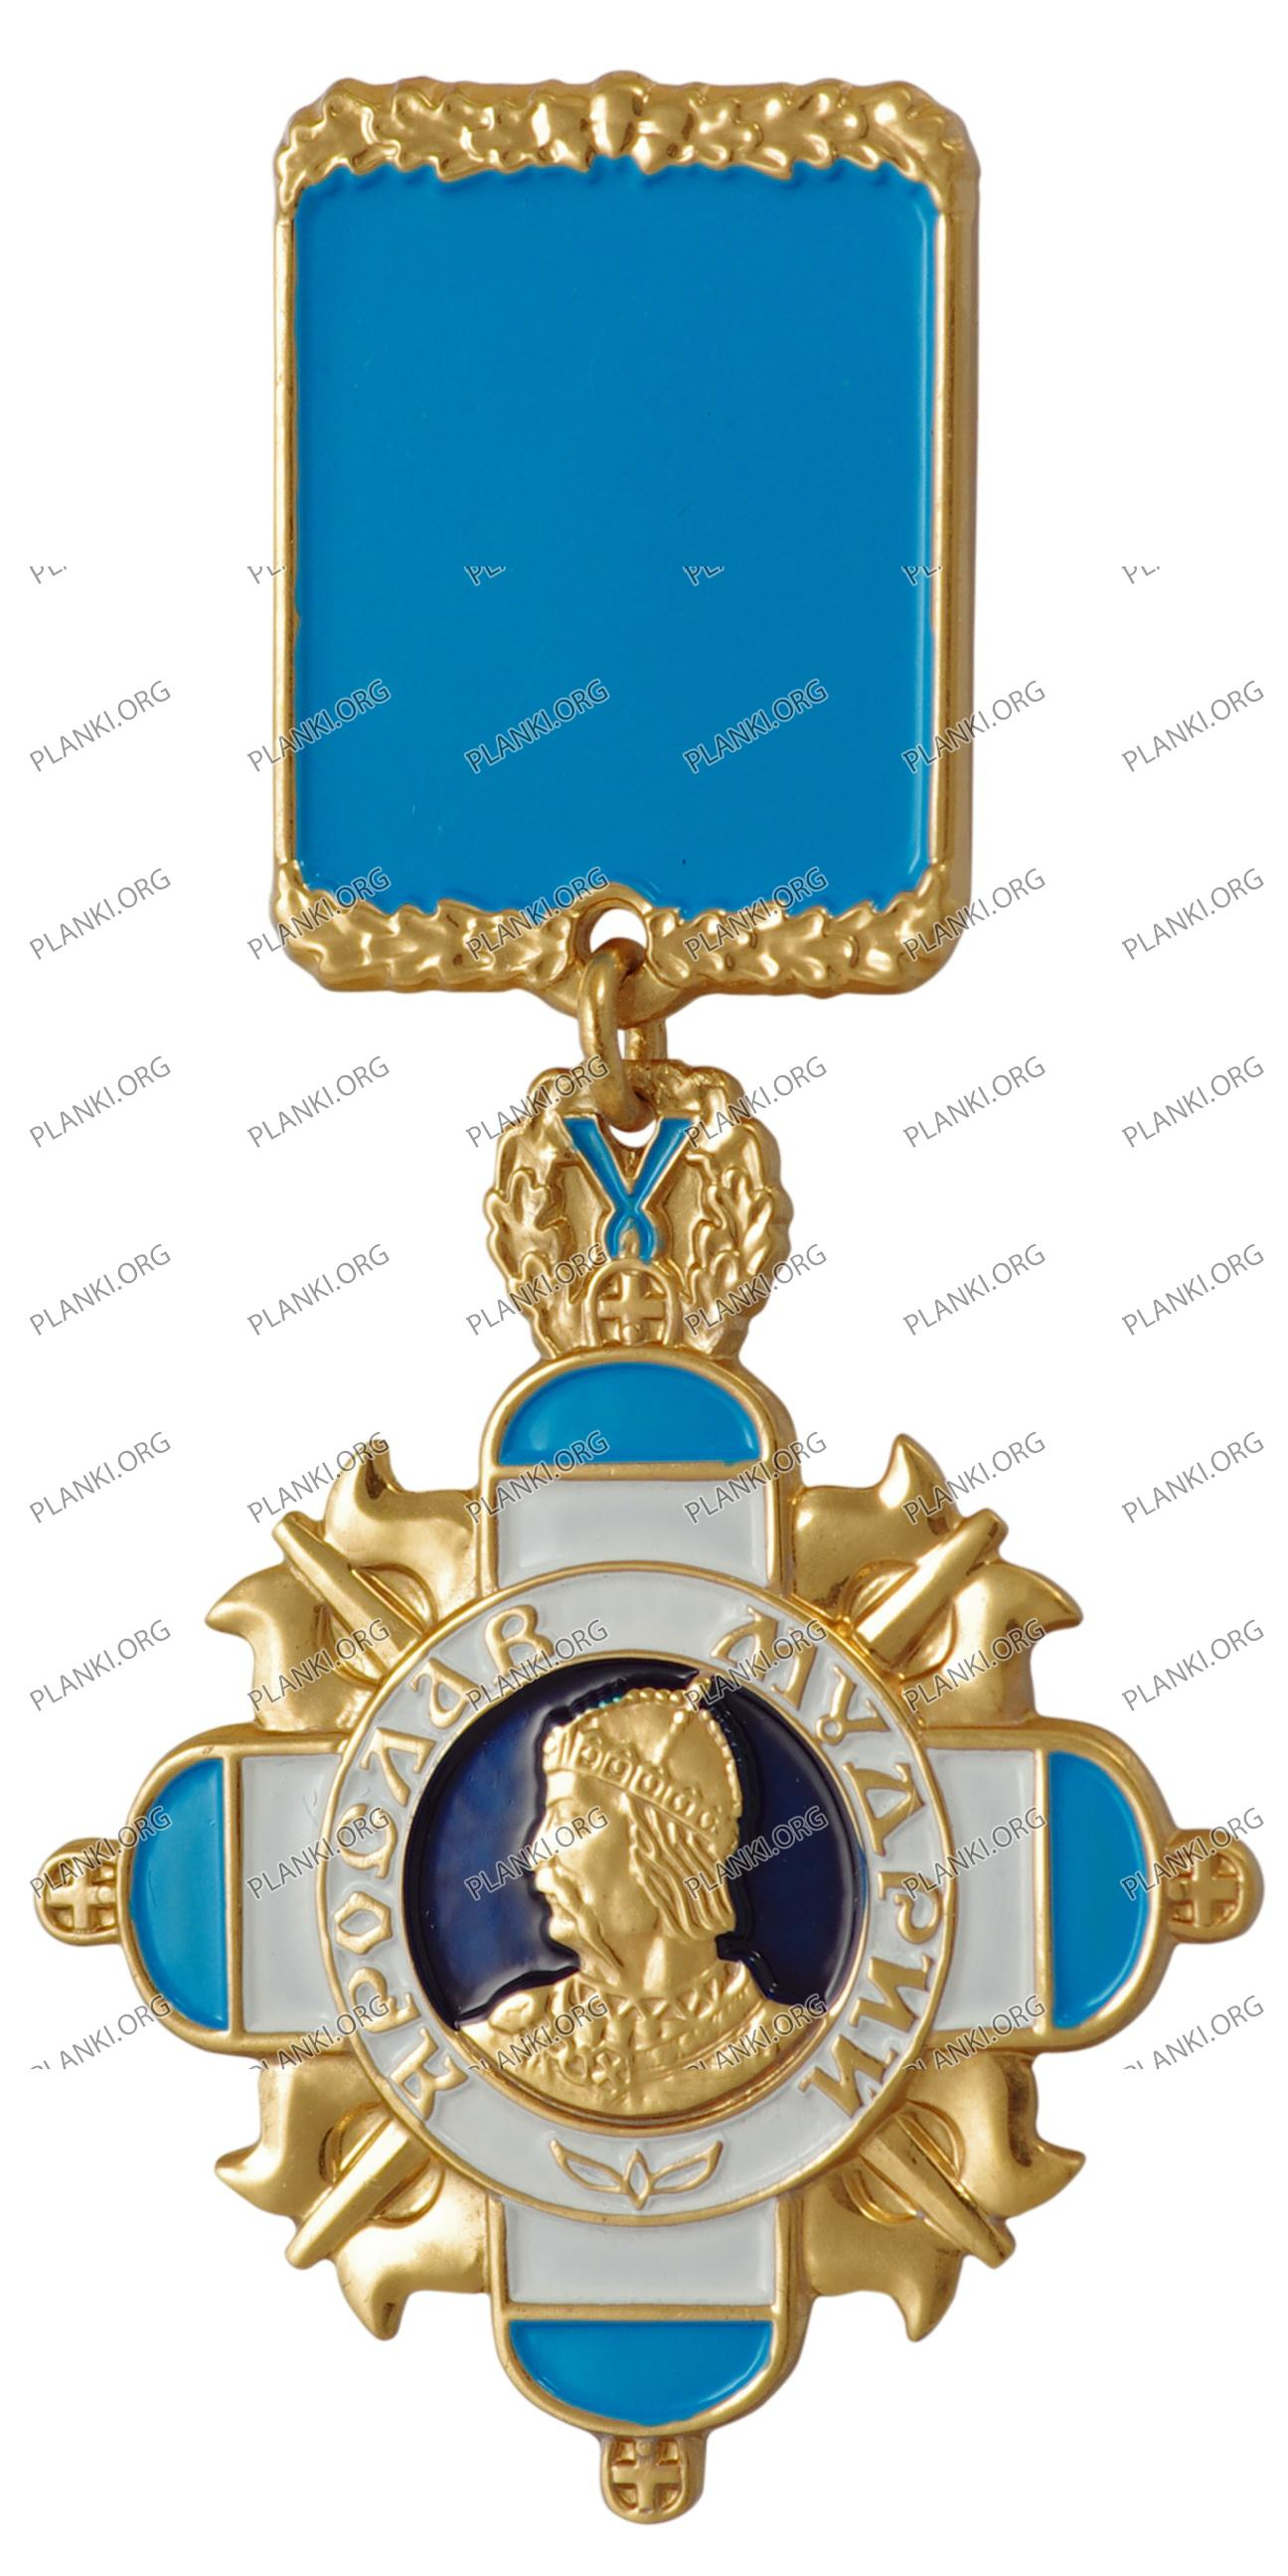 Орден князя Ярослава Мудрого V ступеня